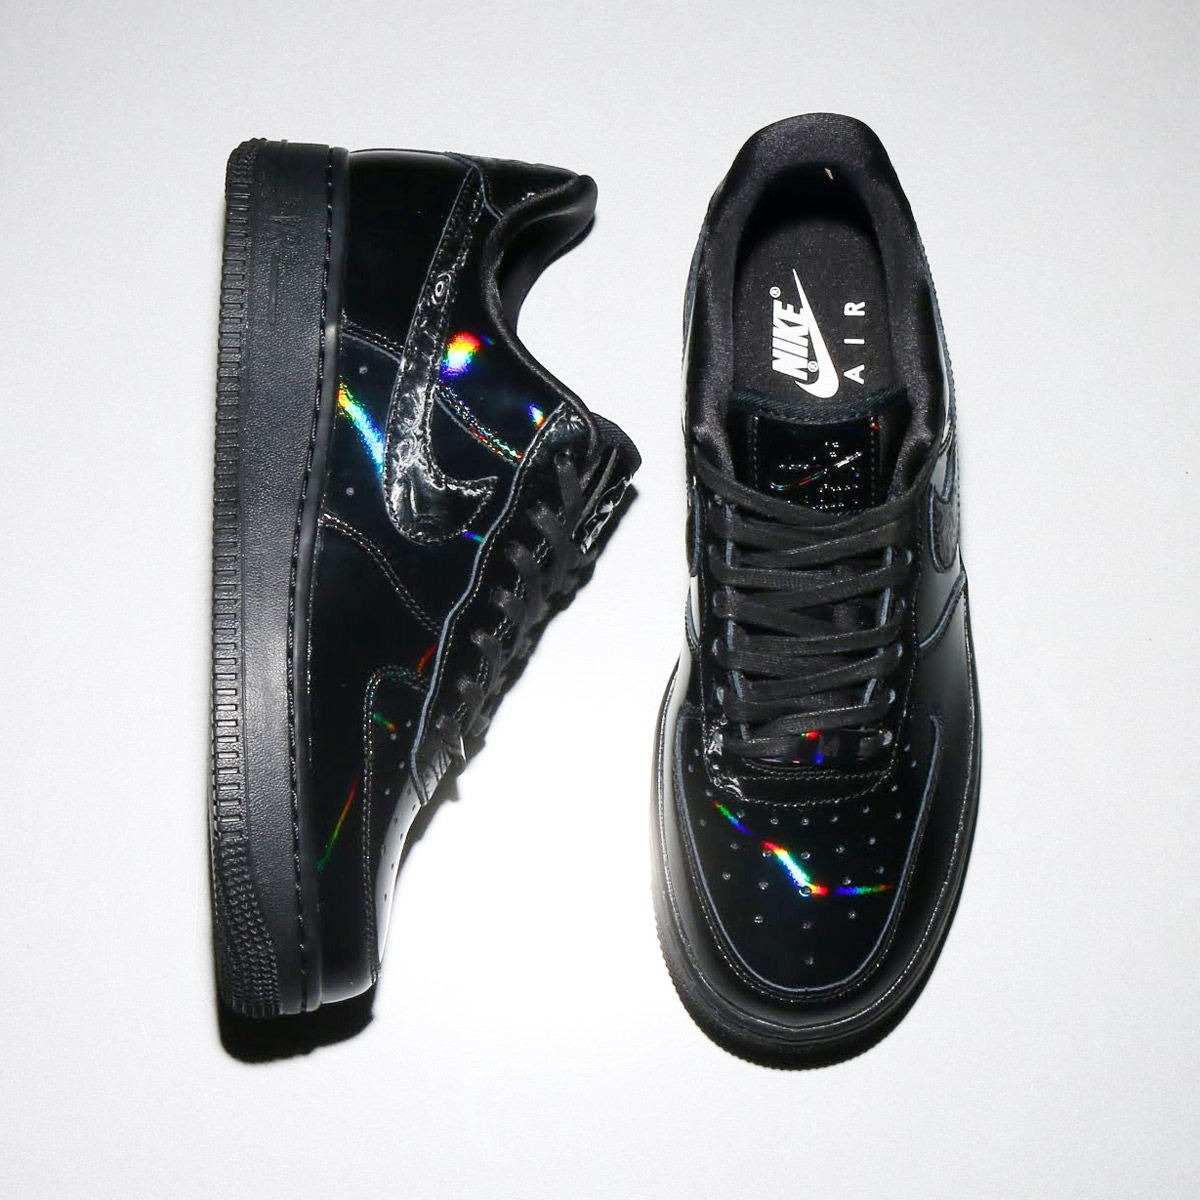 promo code 5dddb e0019 NIKE WMNS AIR FORCE 1  07 LX (Nike women air force 1 07 LX) (BLACK BLACK-SUMMIT  WHITE)18SP-S